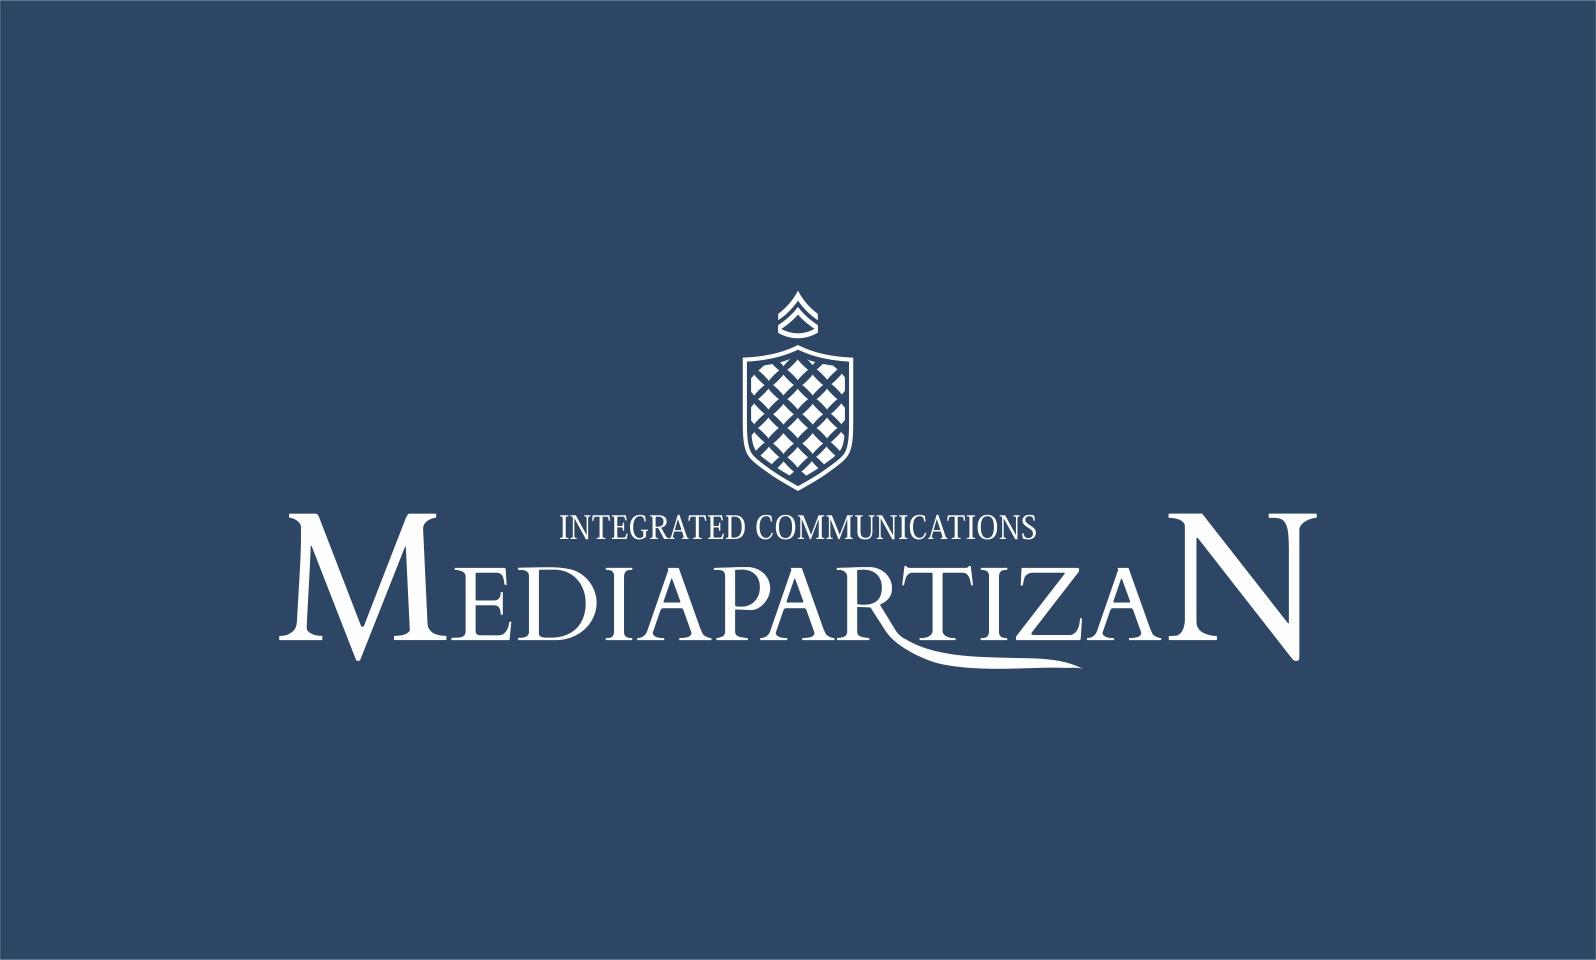 mediapartizan_logo.jpg